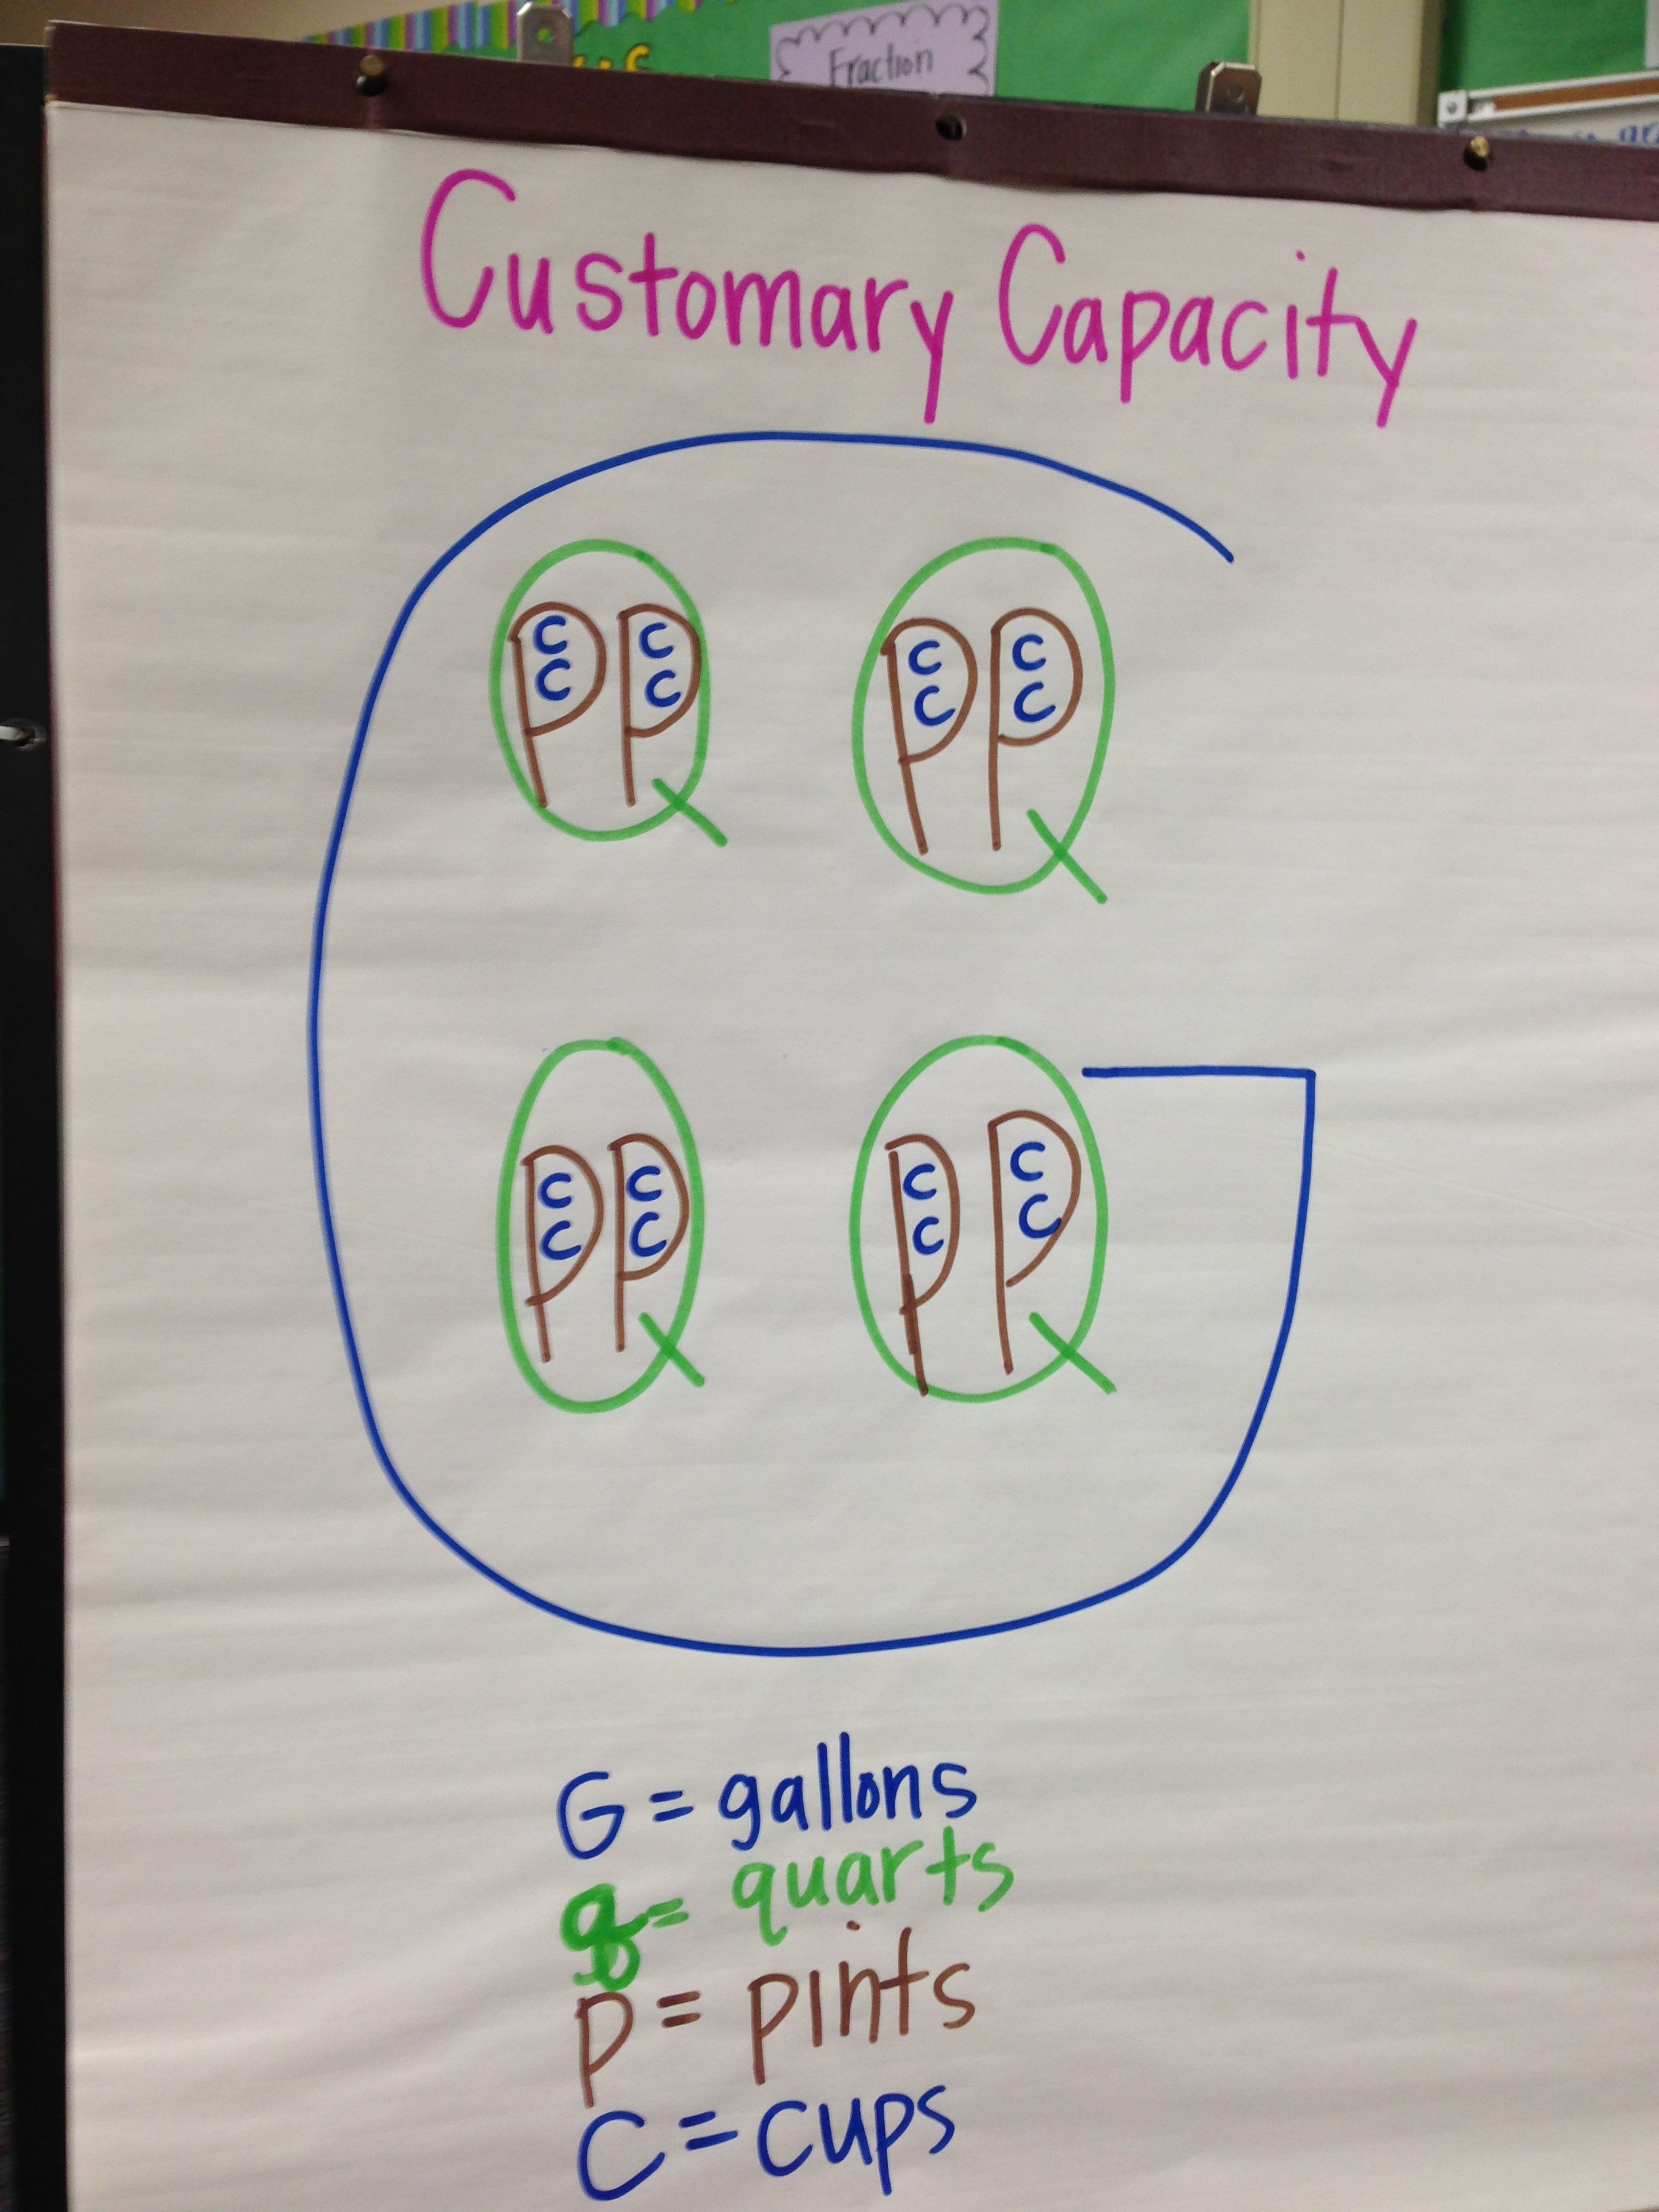 Customary Capacity Volume Conversion Chart